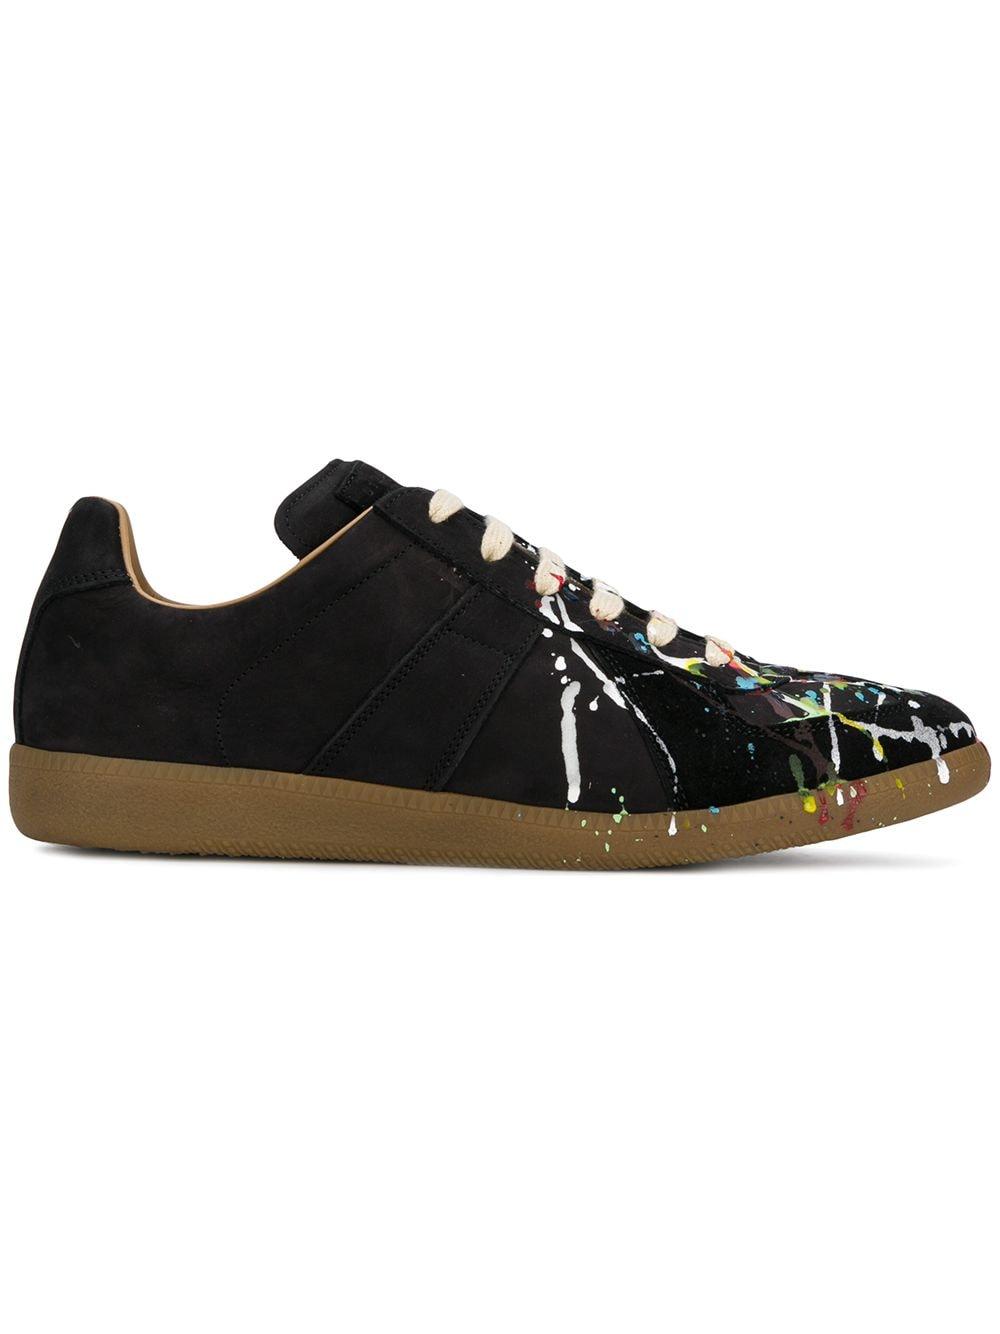 SNEAKERS REPLICA UOMO MAISON MARGIELA | Sneakers | S57WS0240 P1892963